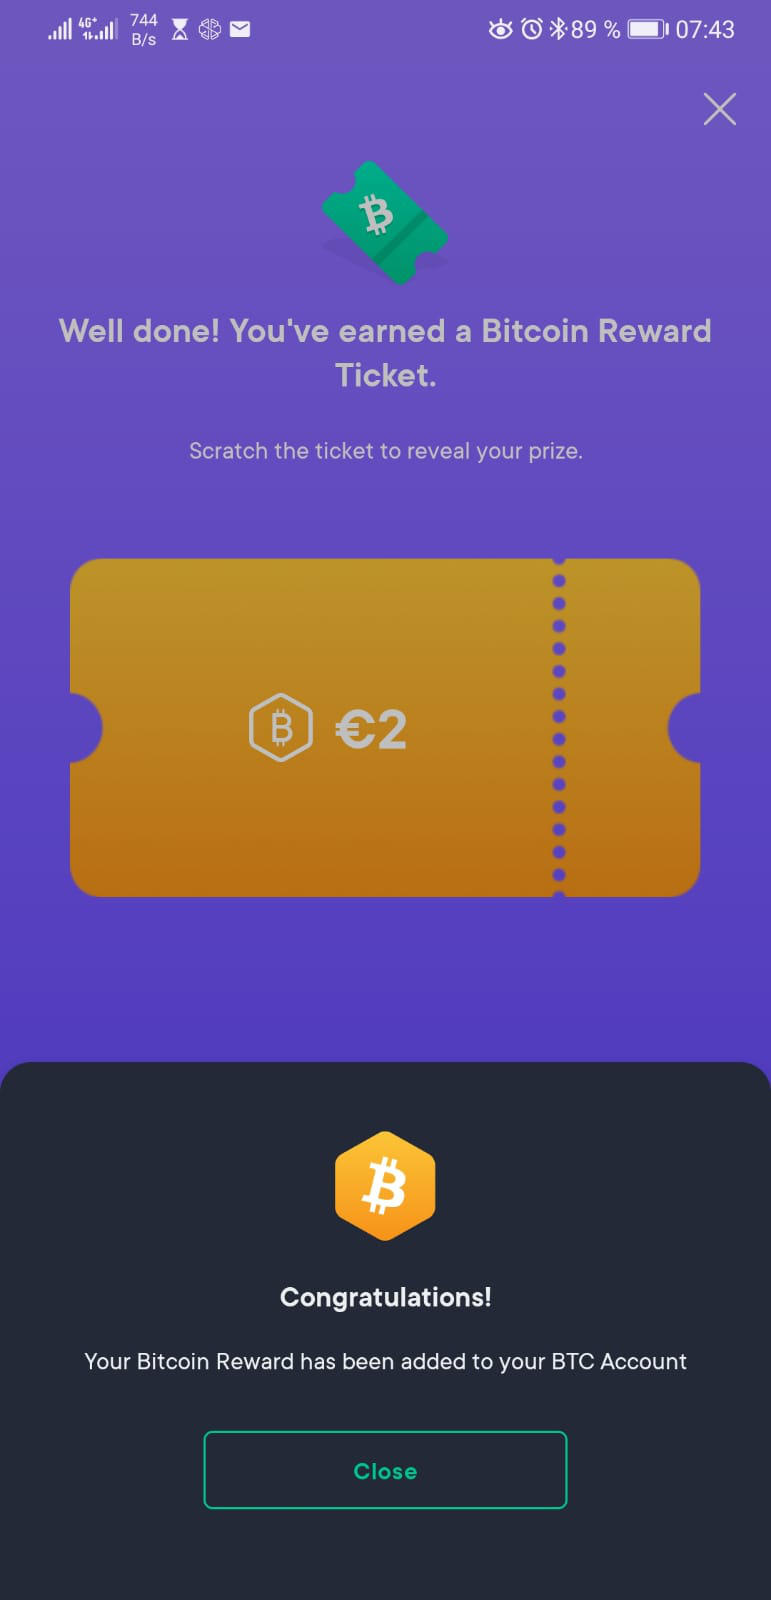 crypto_exchange_swissborg_join_reward_other_person